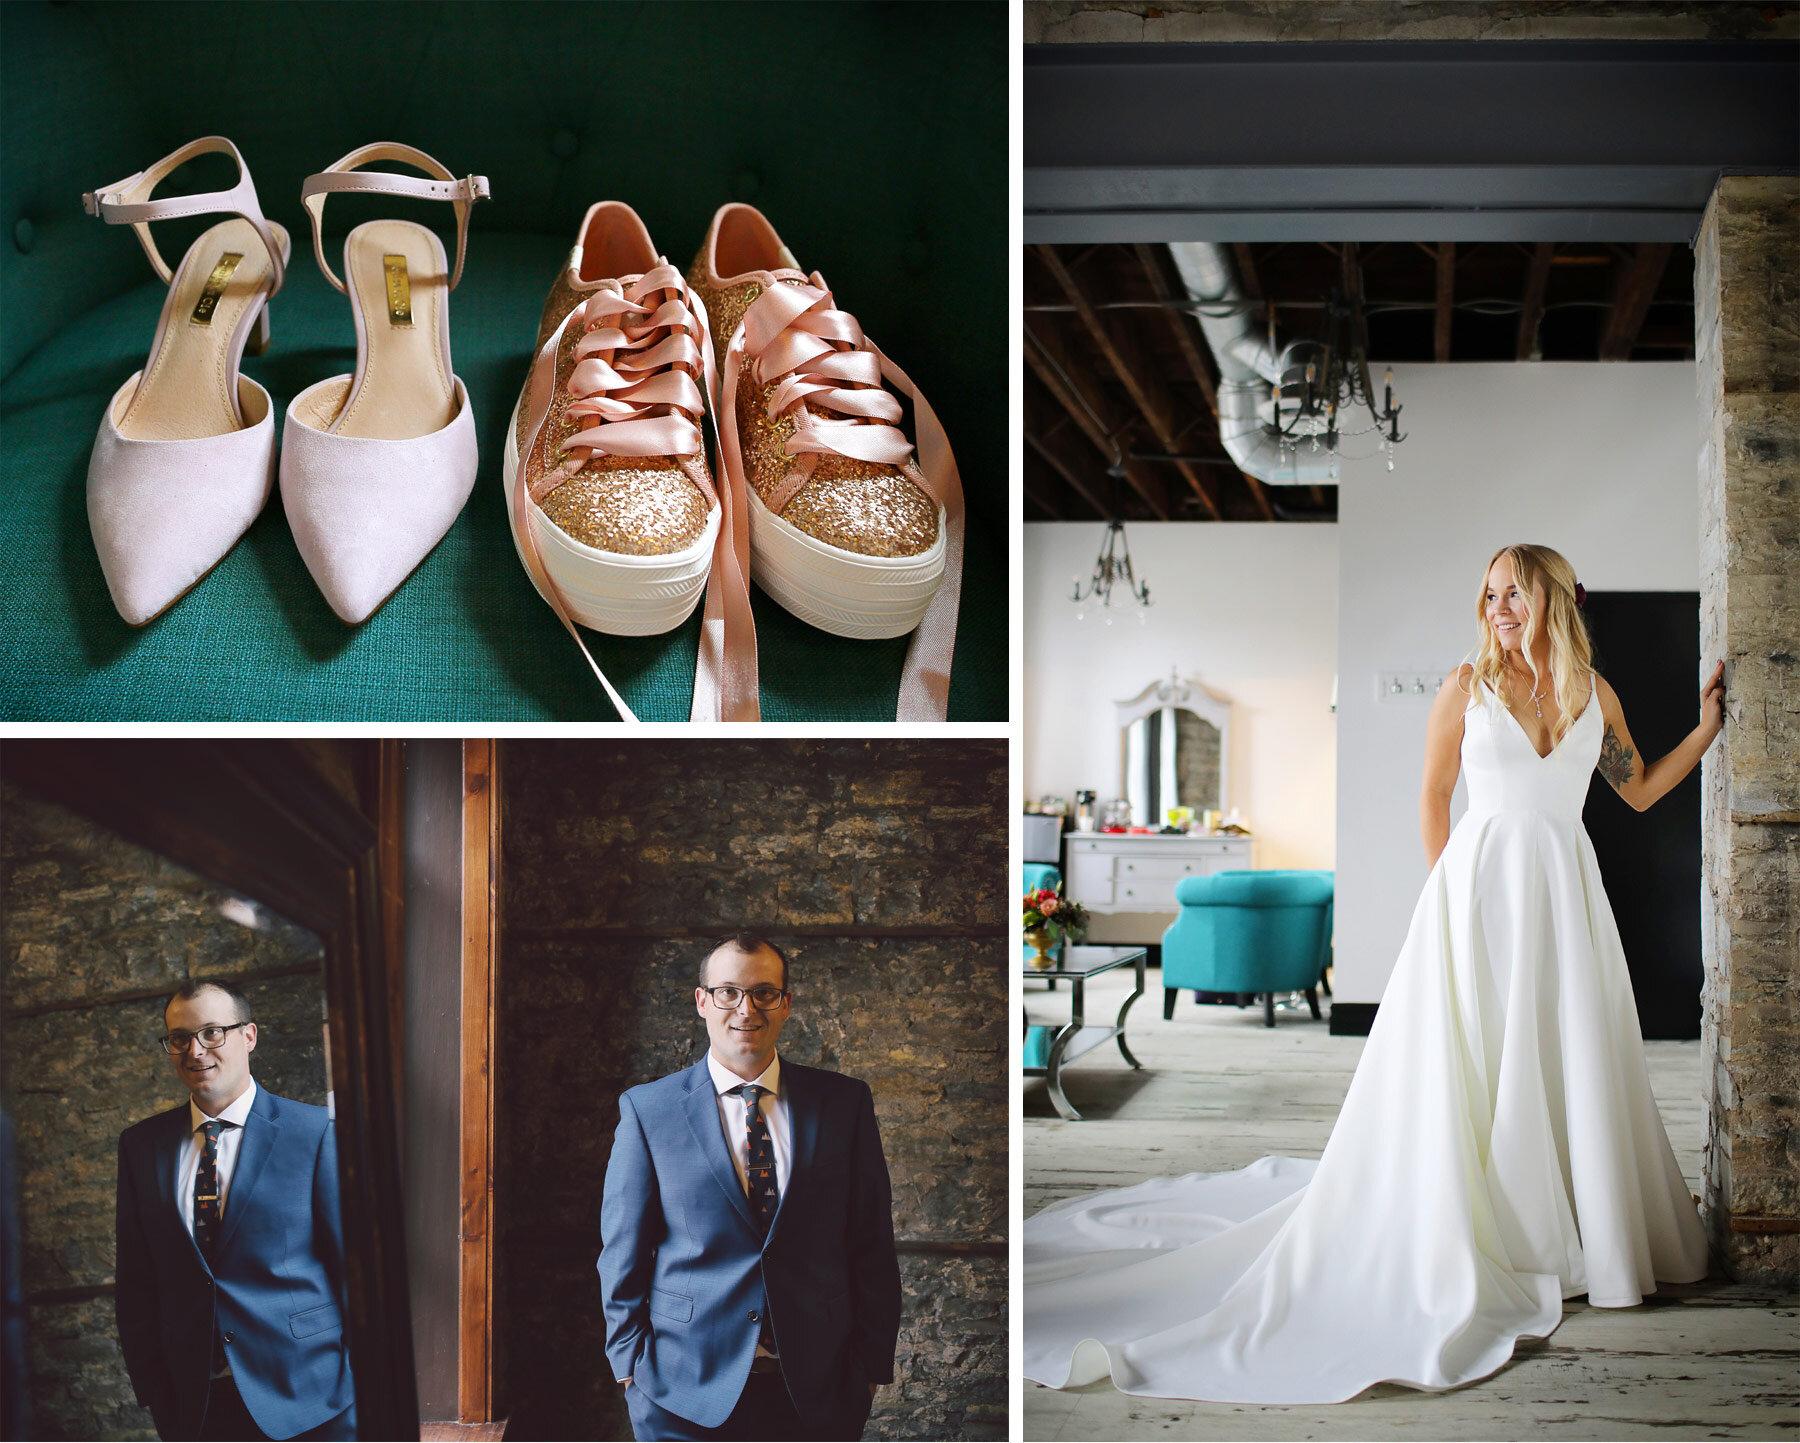 01-Vick-Photography-Wedding-Minneapolis-Minnesota-Earl-and-Wilson-Bride-Groom-Shoes-Danielle-and-Tom.jpg